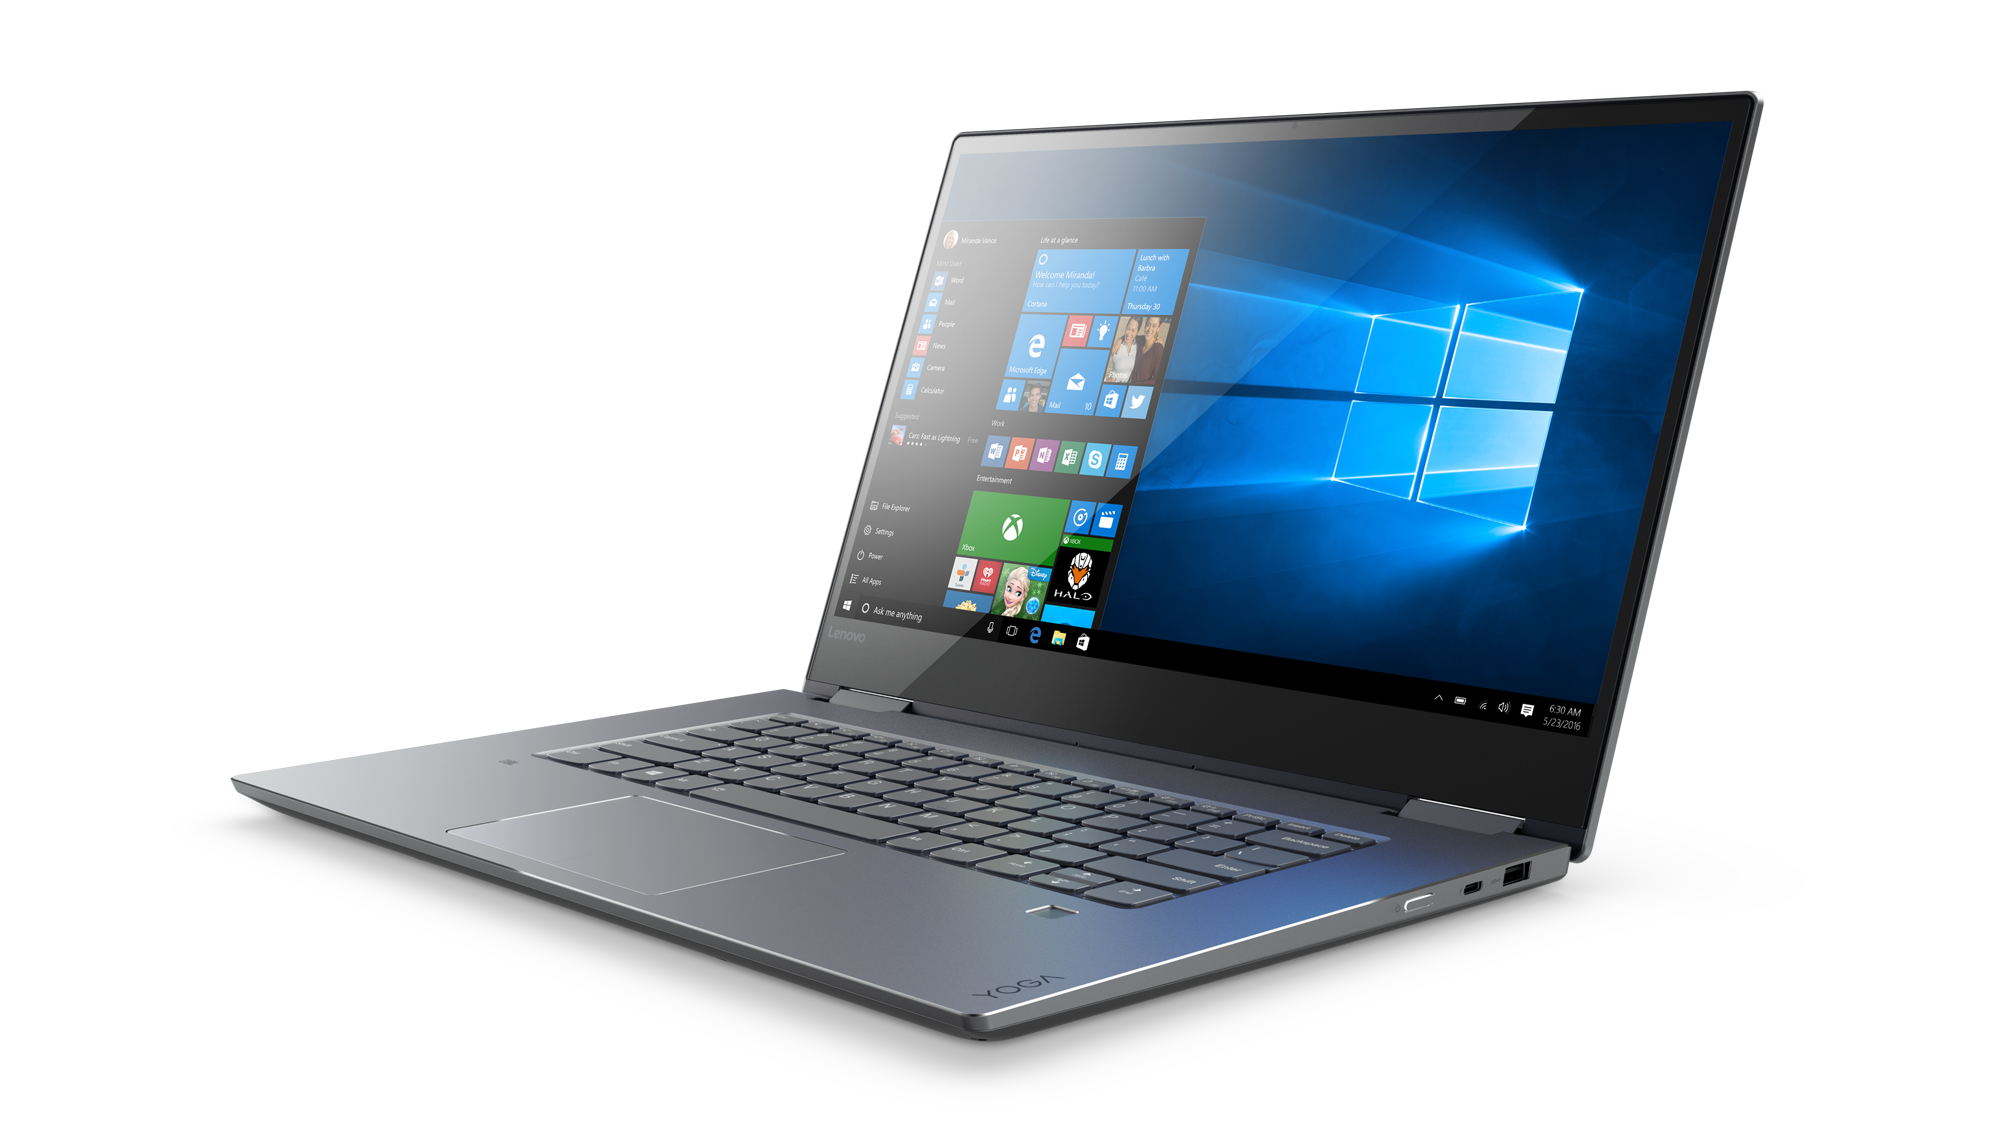 "Lenovo YOGA 720-15IKB i7-7700HQ 3,80GHz/16GB/SSD 512GB/15,6"" 4K/IPS/AG/multitouch/GeForce 4GB/WIN10 PRO šedá 80X70074CK"